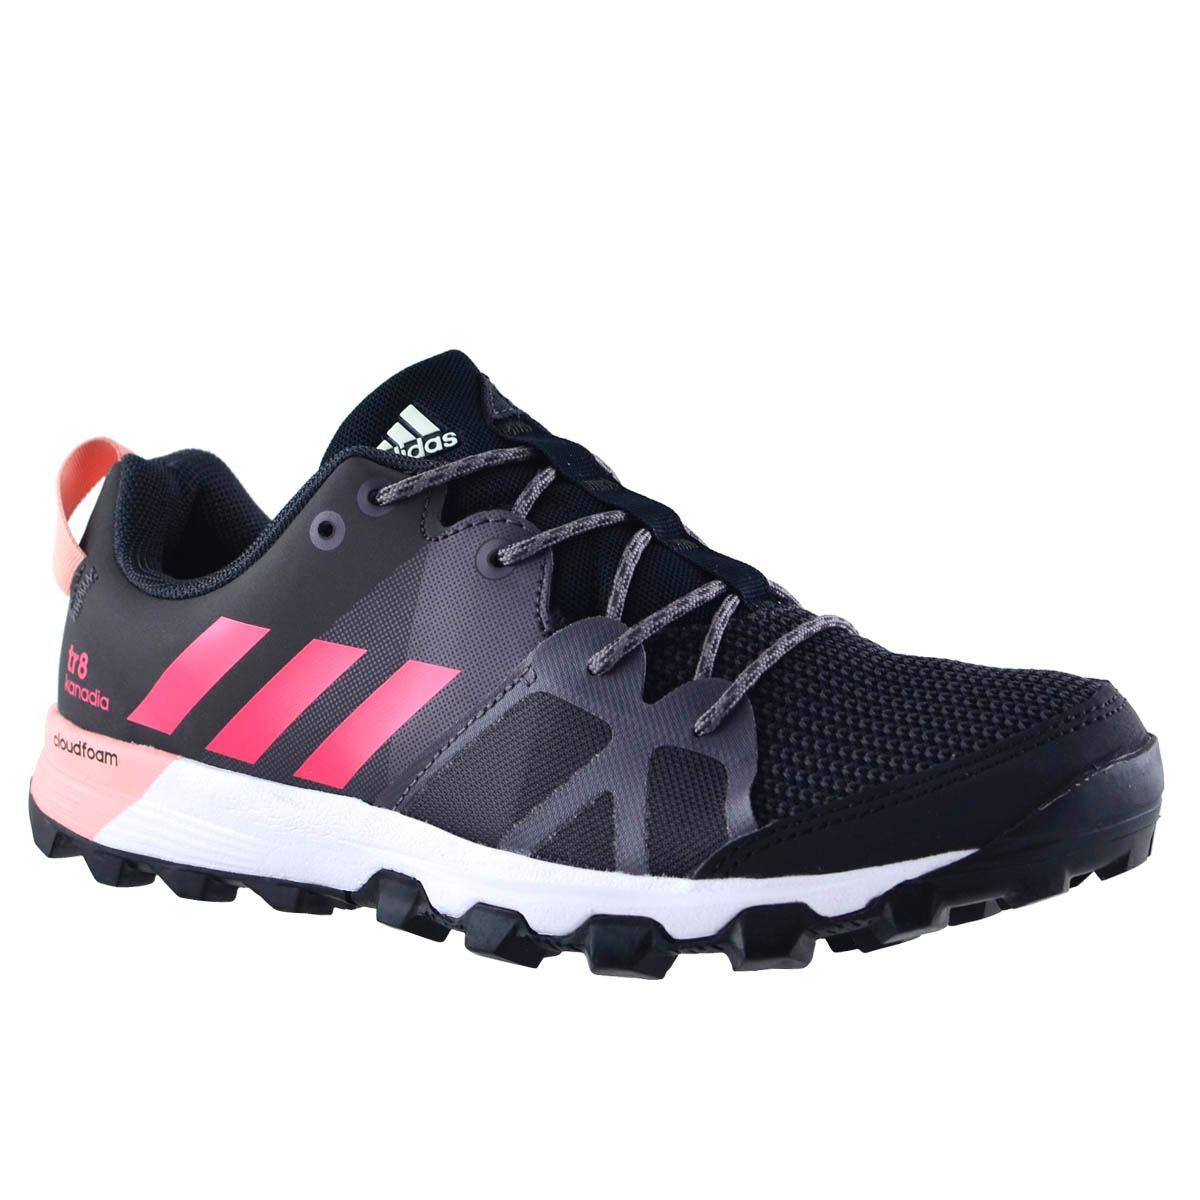 online store 6a232 dcb34 zapatillas adidas kanadia 8 tr mujer negro. Cargando zoom.